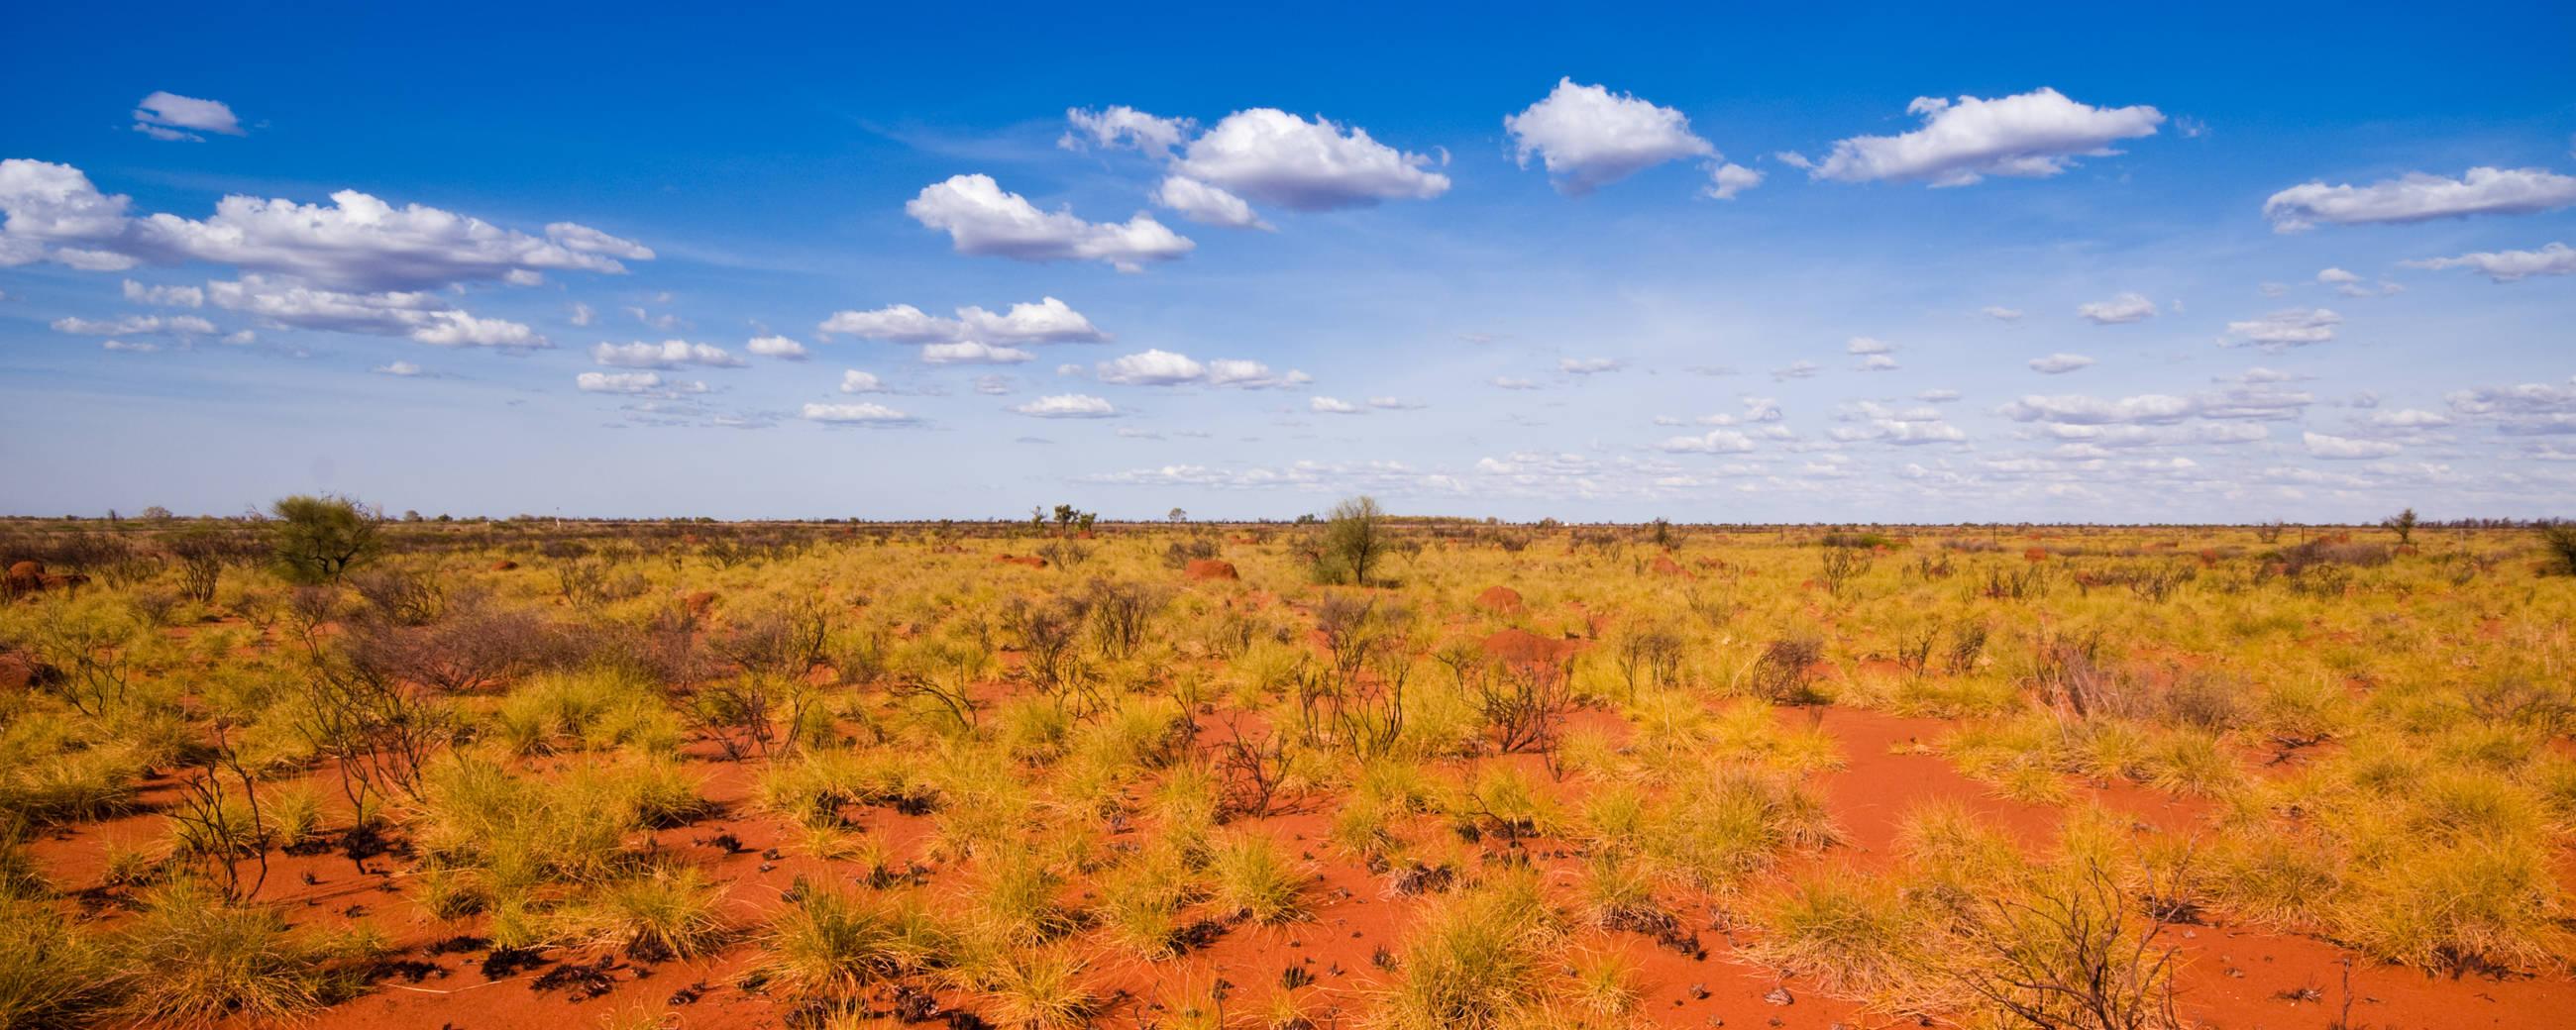 Western-Australia-and-the-Undiscovered-Coast